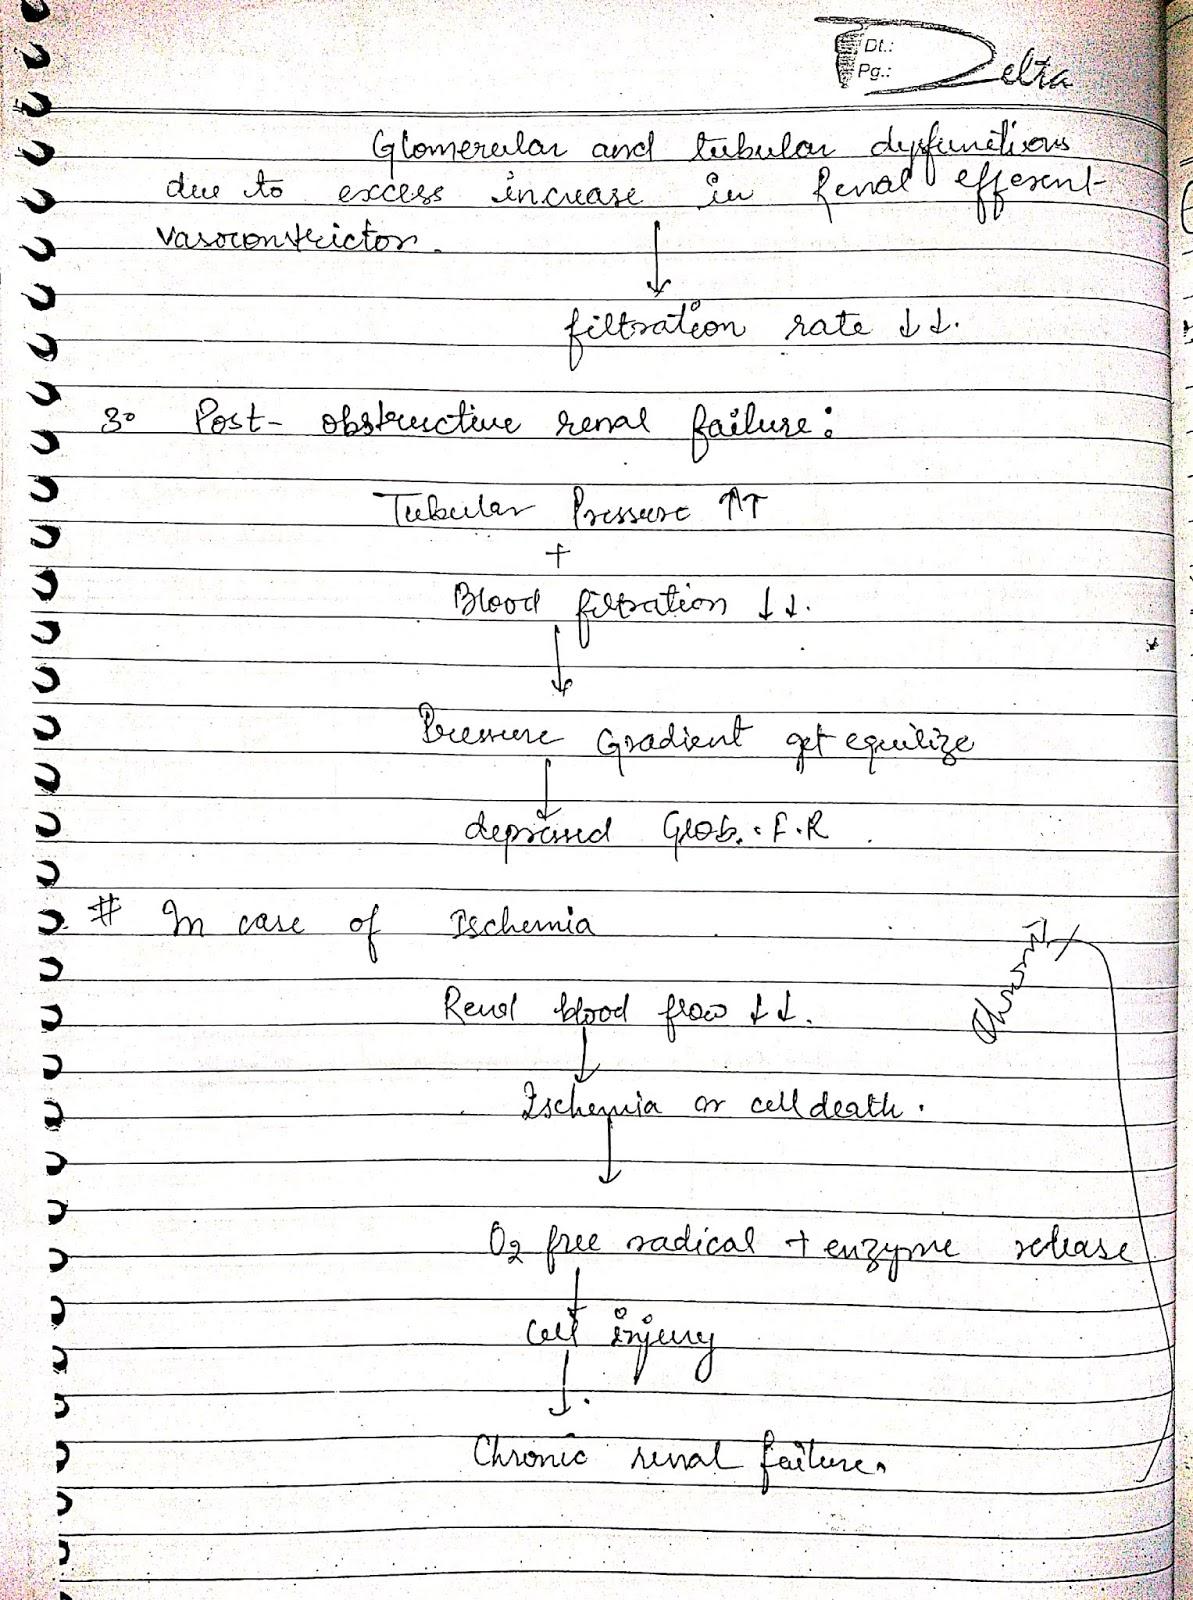 pathophysiology - renal disorder acute renal failure